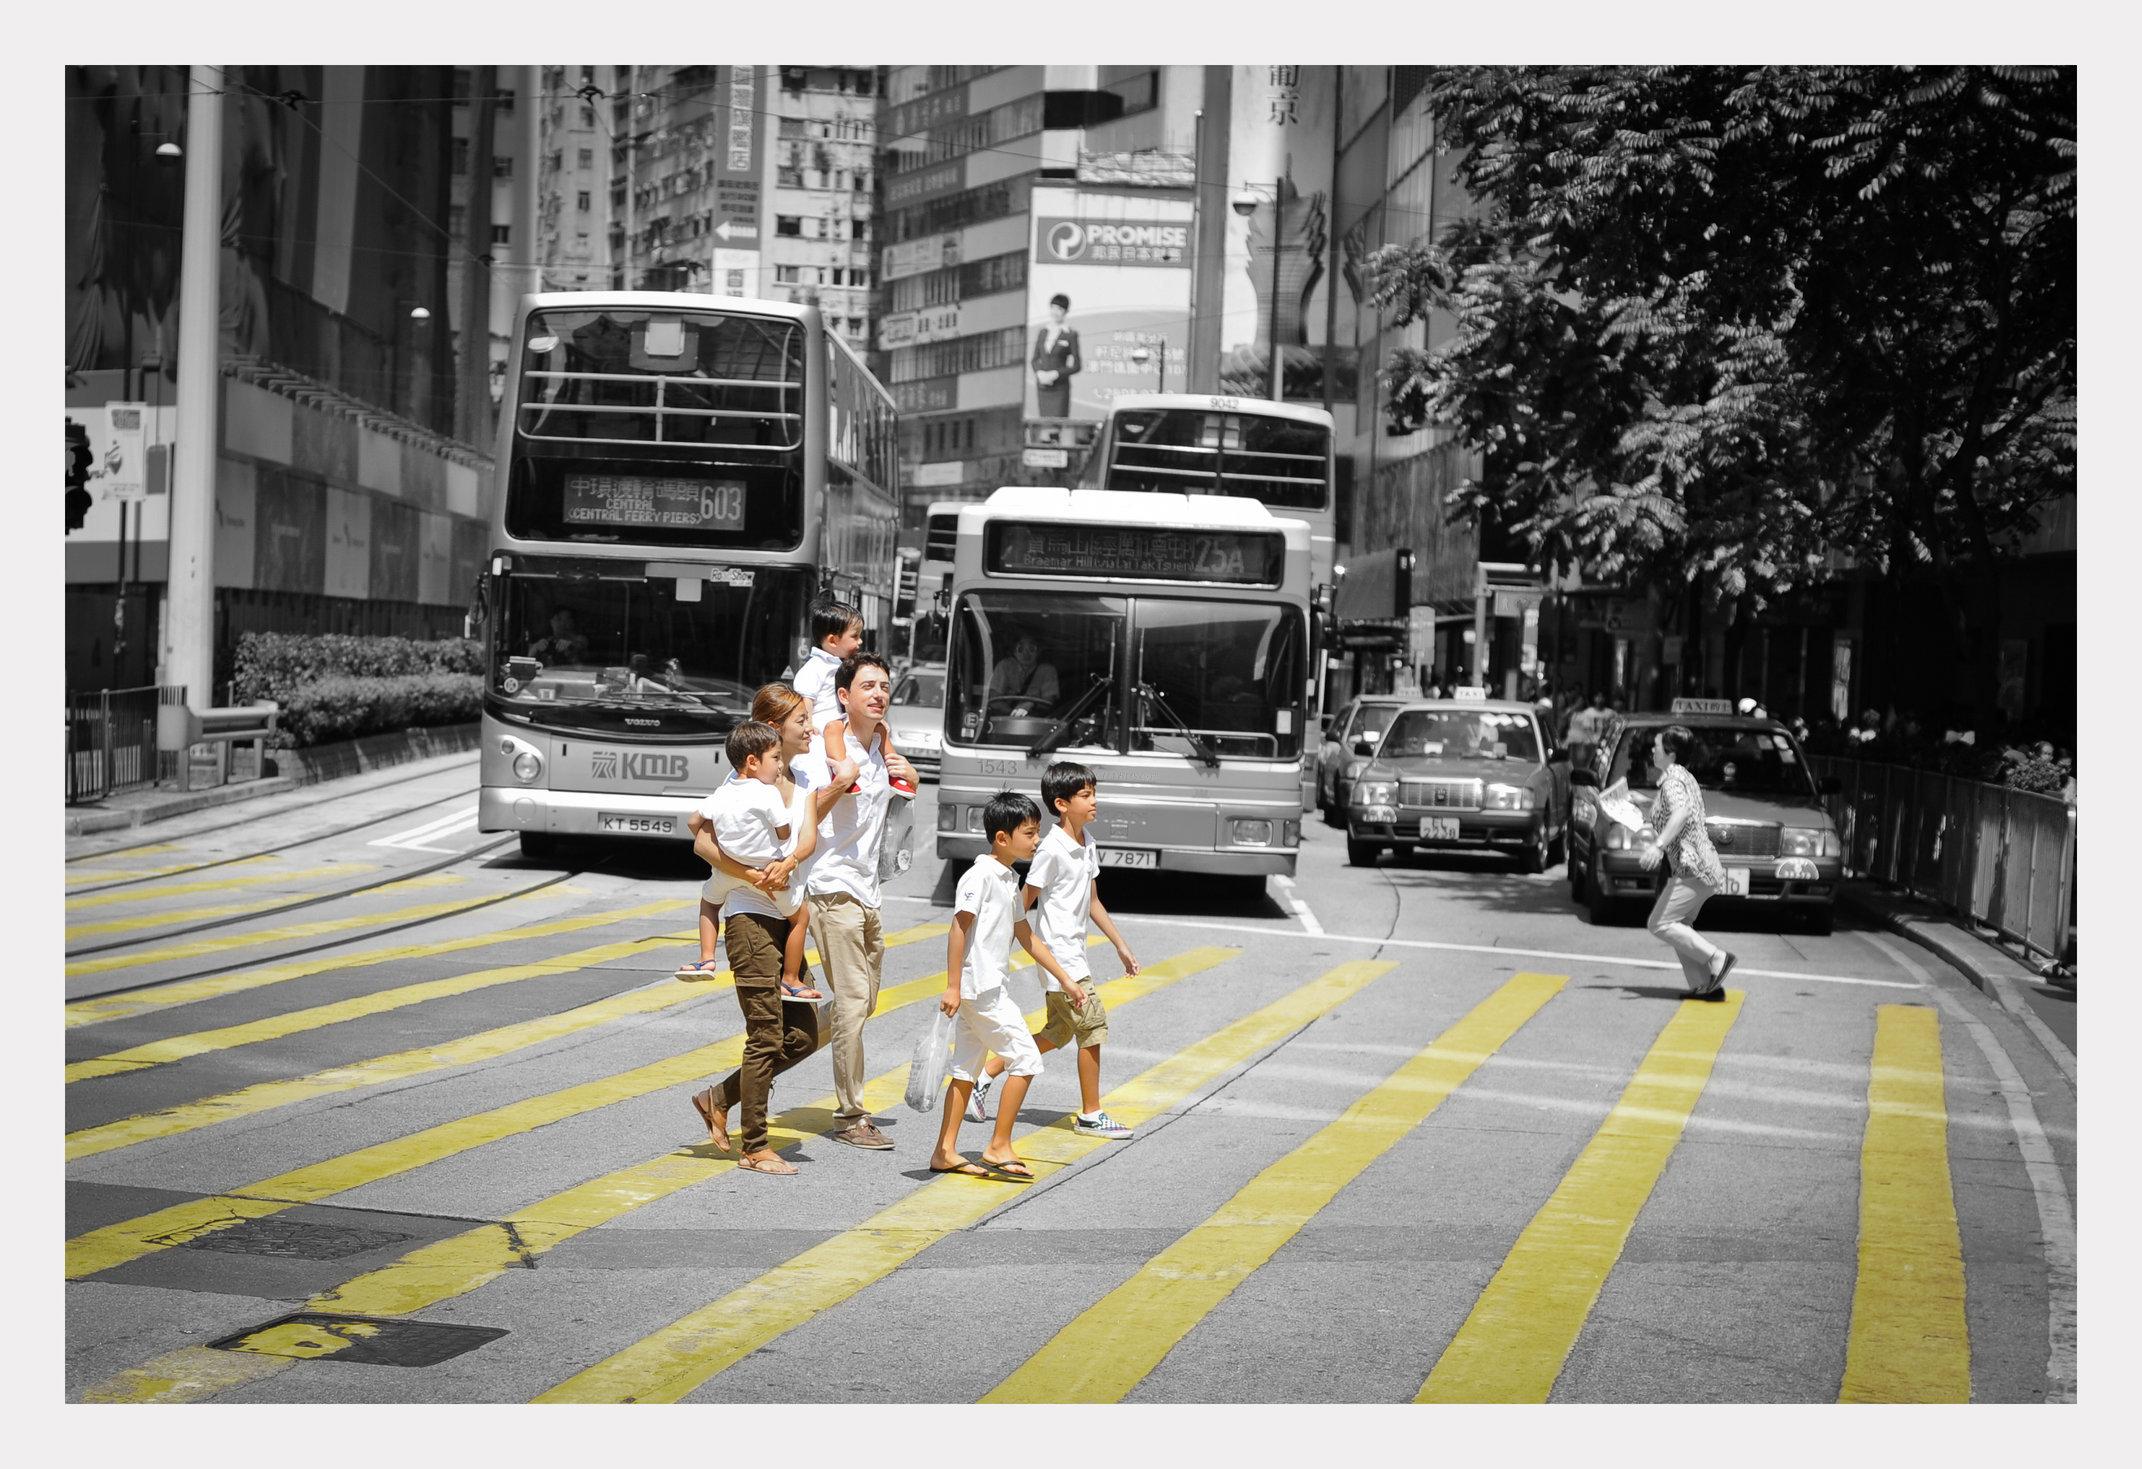 DSC_8710-Edit-2.jpg